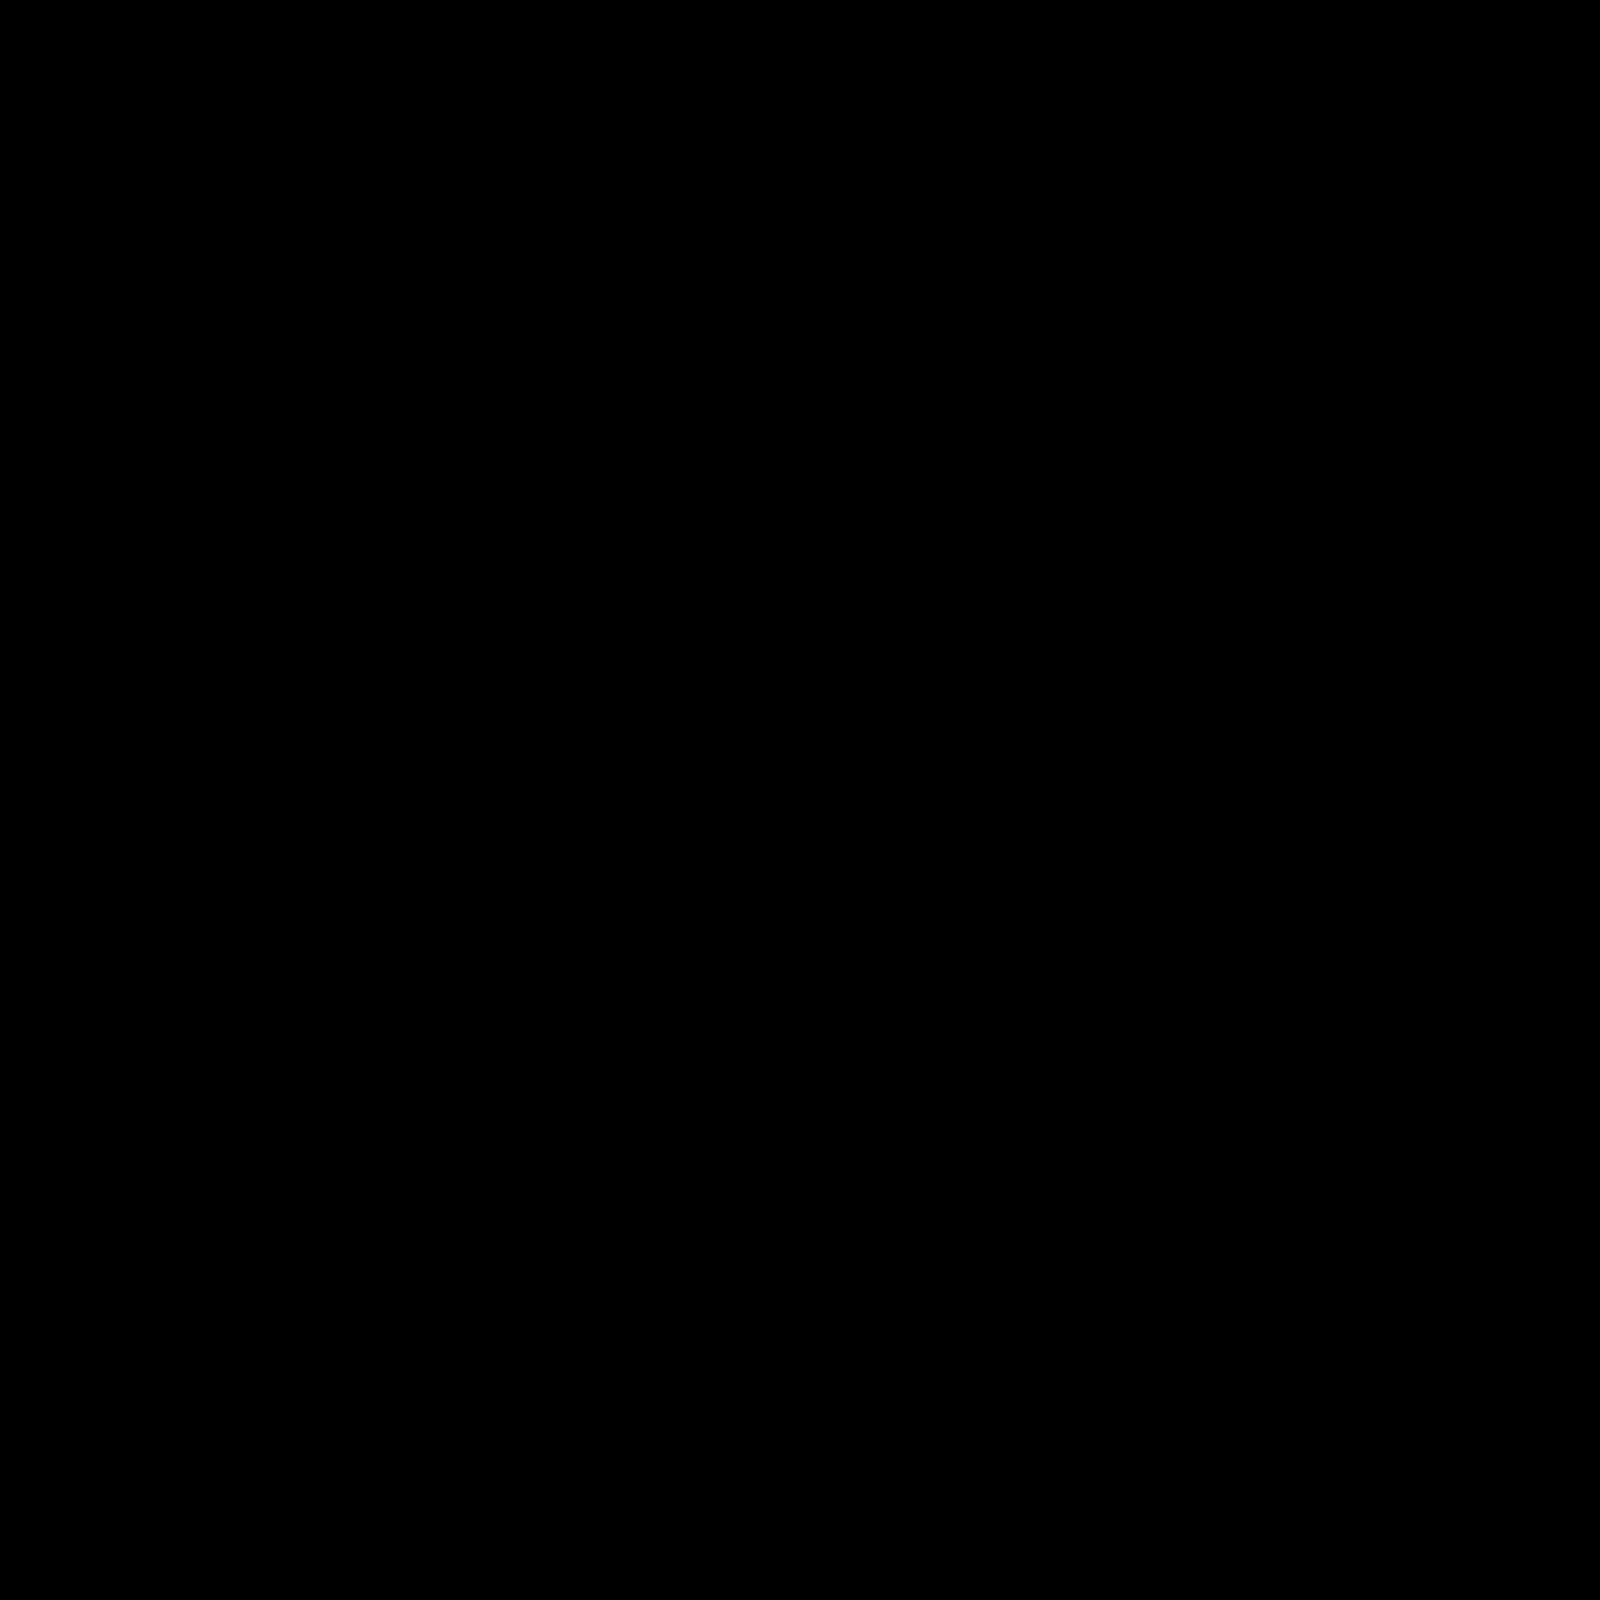 Symbols icons email symbol. Phone clipart resume